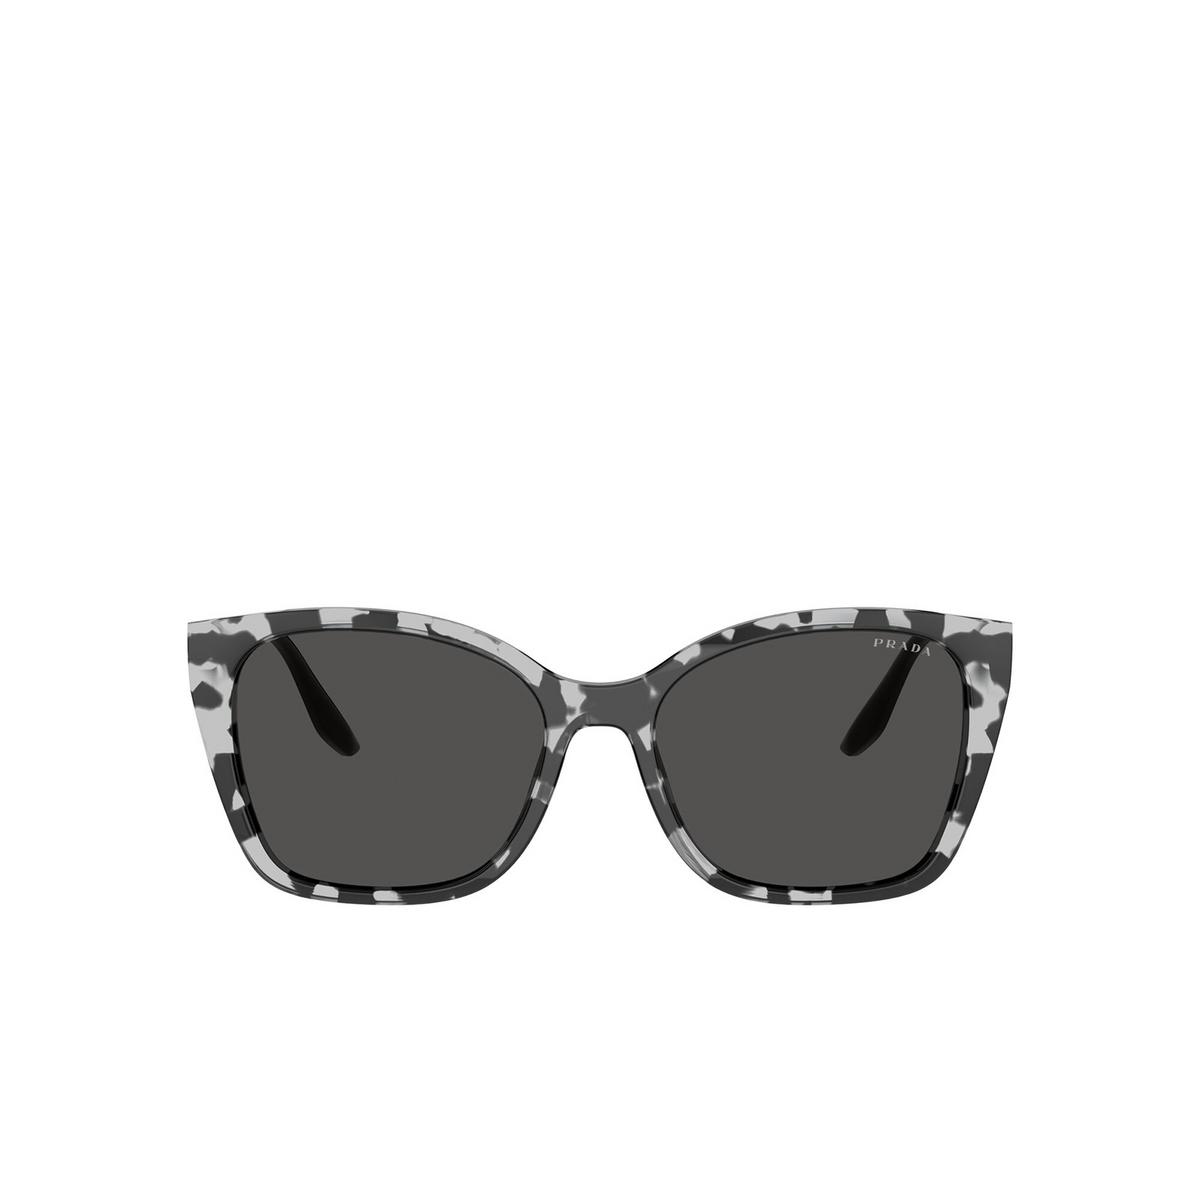 Prada® Cat-eye Sunglasses: PR 12XS color Grey Tortoise 5285S0 - front view.